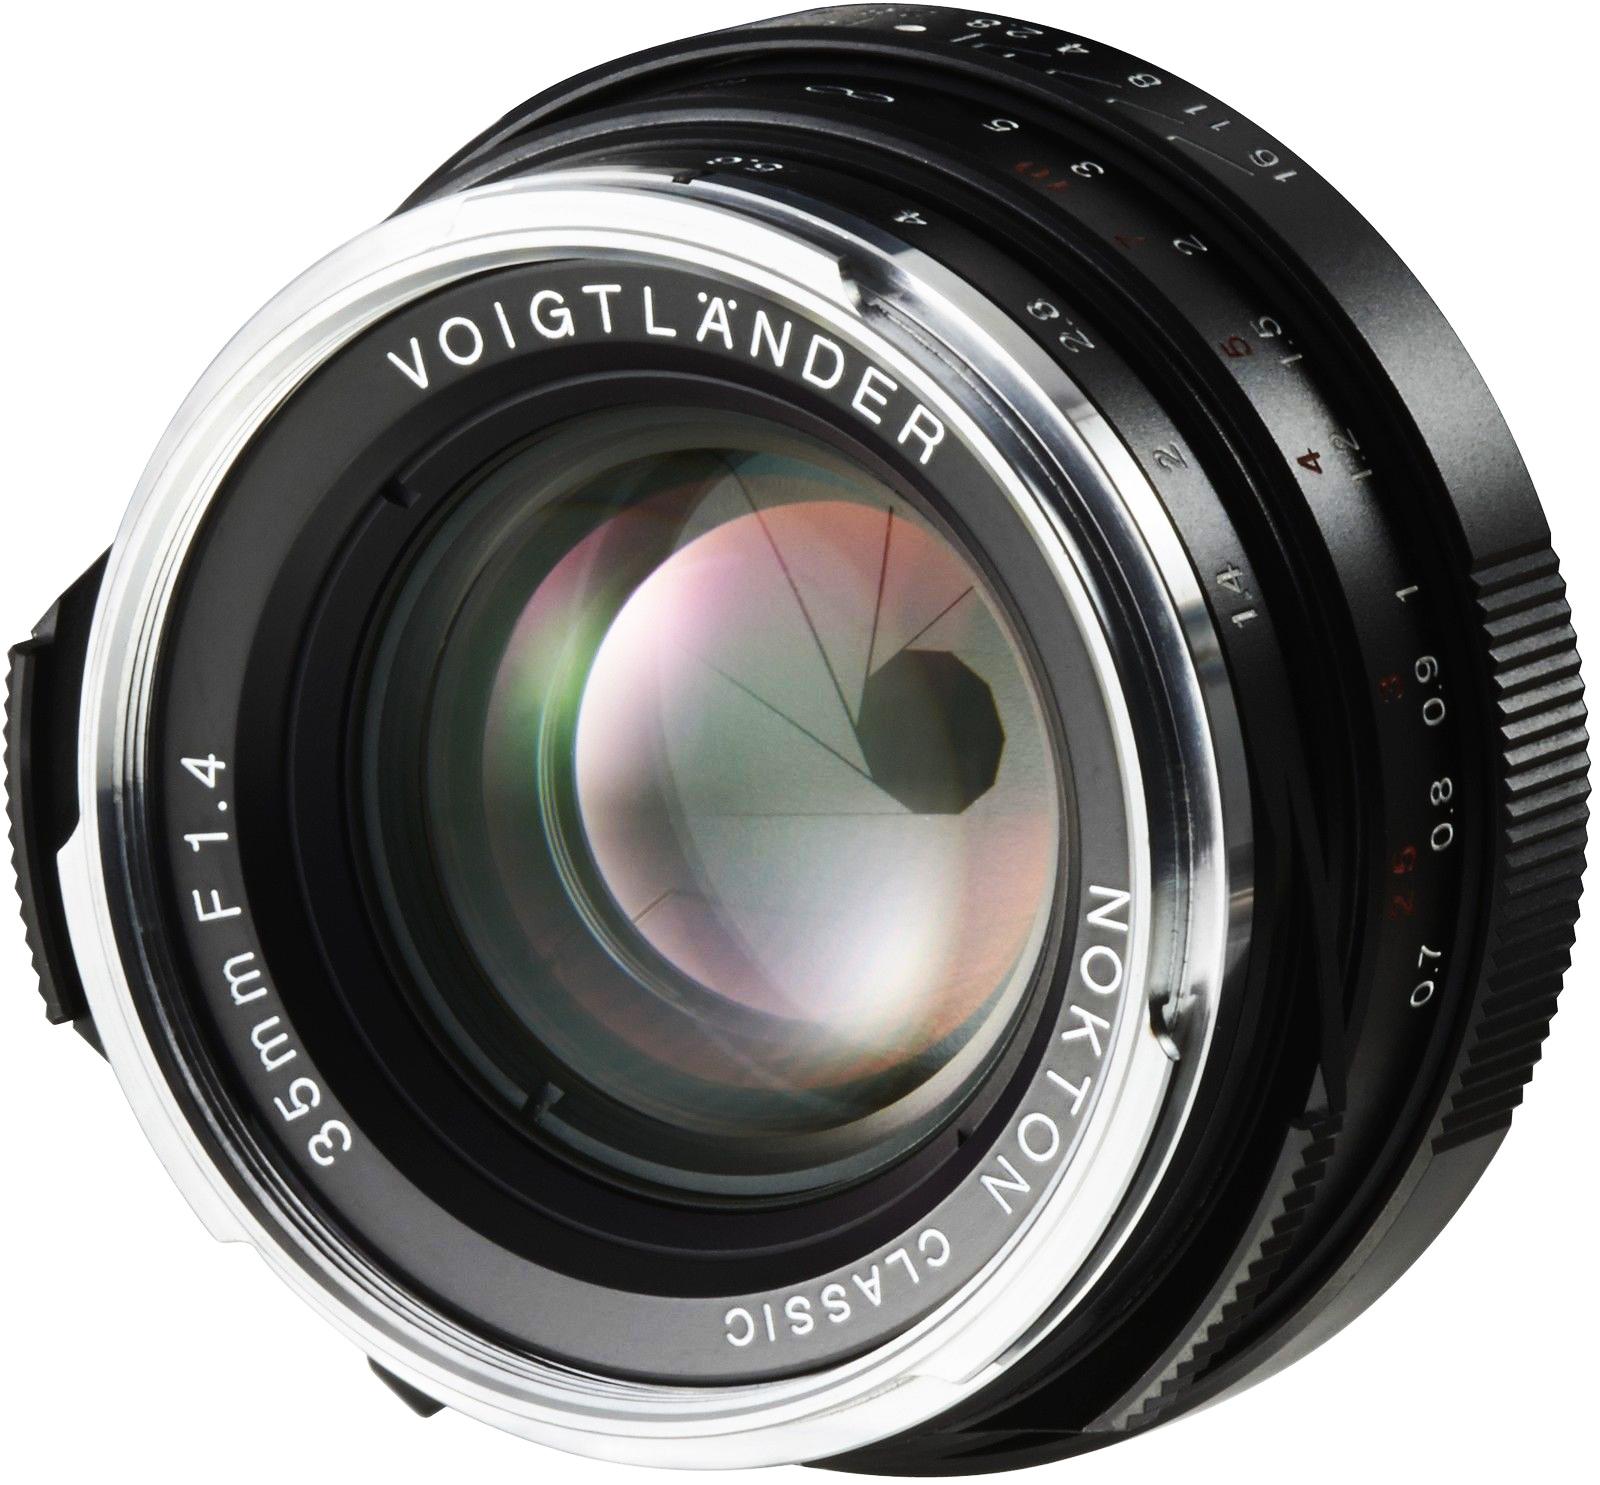 Voigtlander(フォクトレンダー)の単焦点レンズなど計9点を